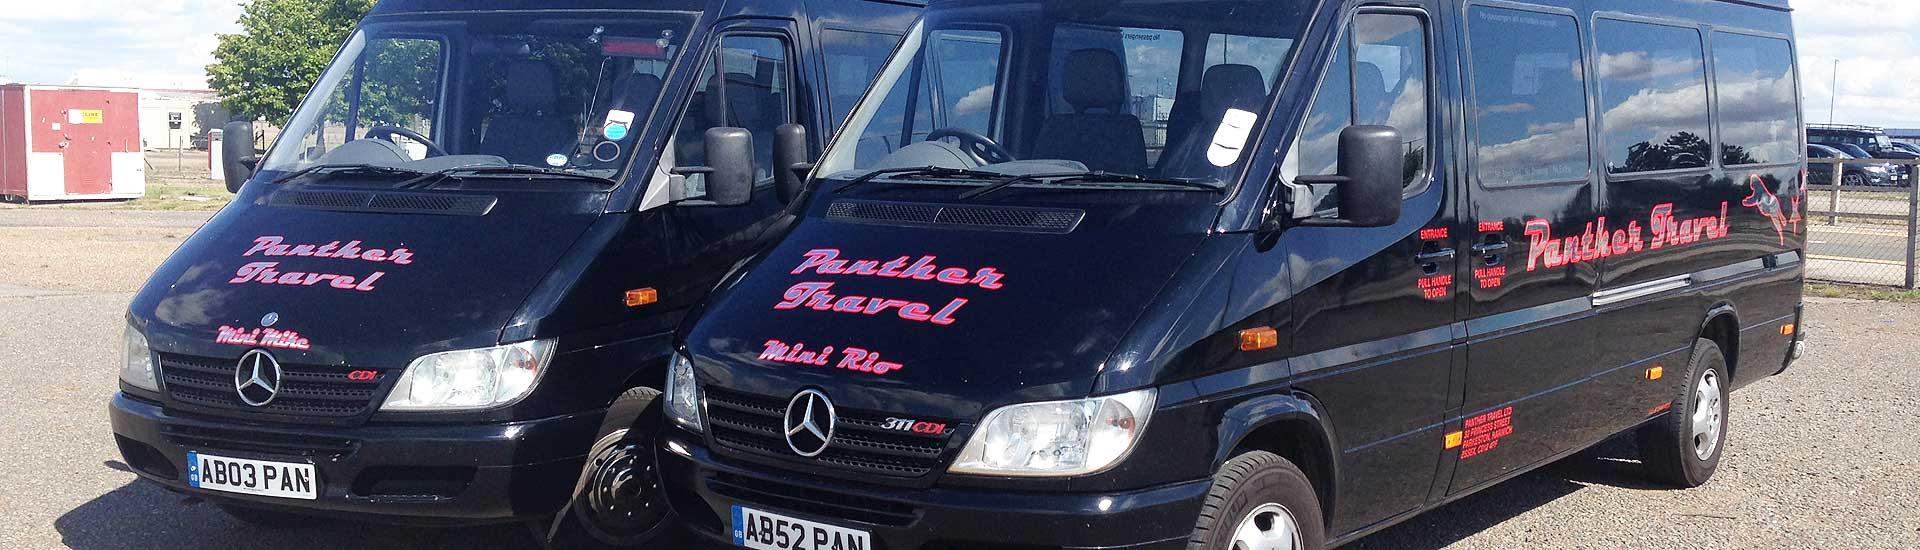 Panther Travel – Coach, Bus & Minibus Hire Across Essex